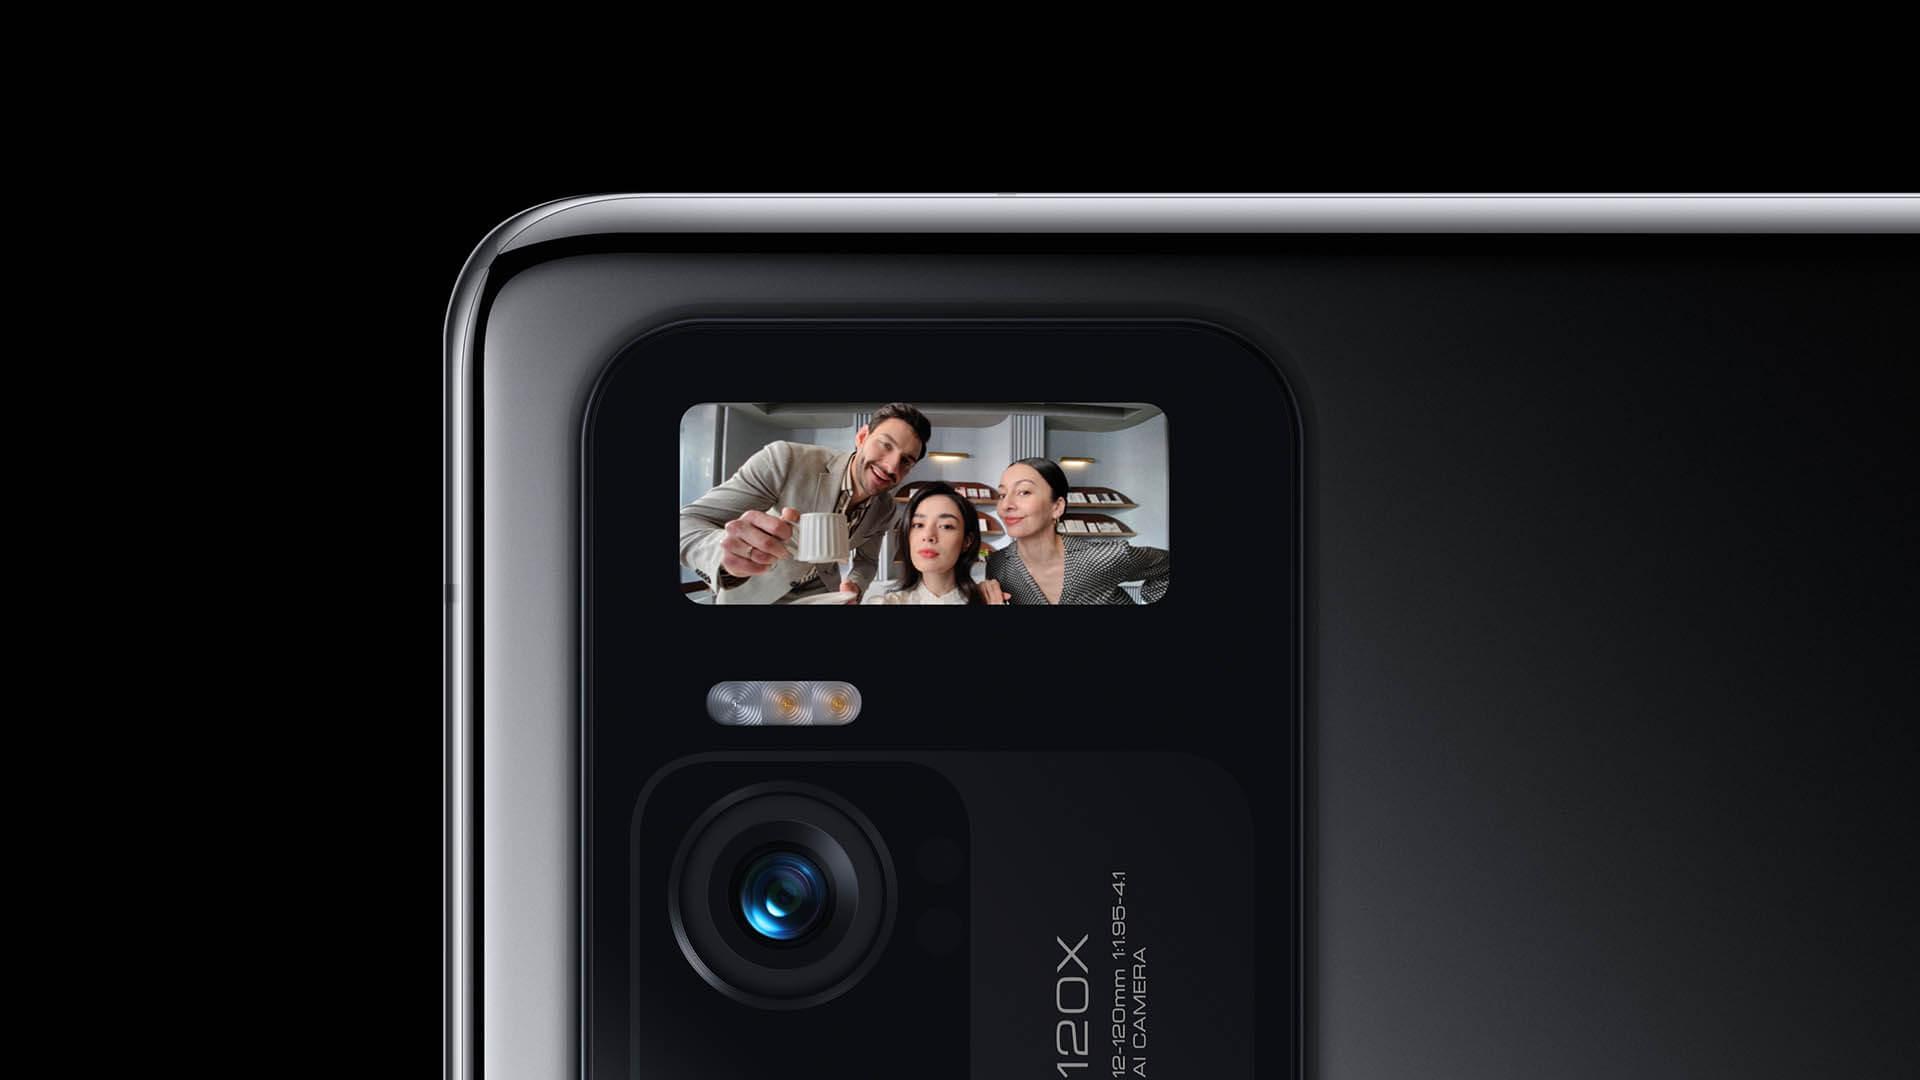 Xiaomi Mi 11 Ultraはサブディスプレイ搭載により背面カメラで自撮りが出来る